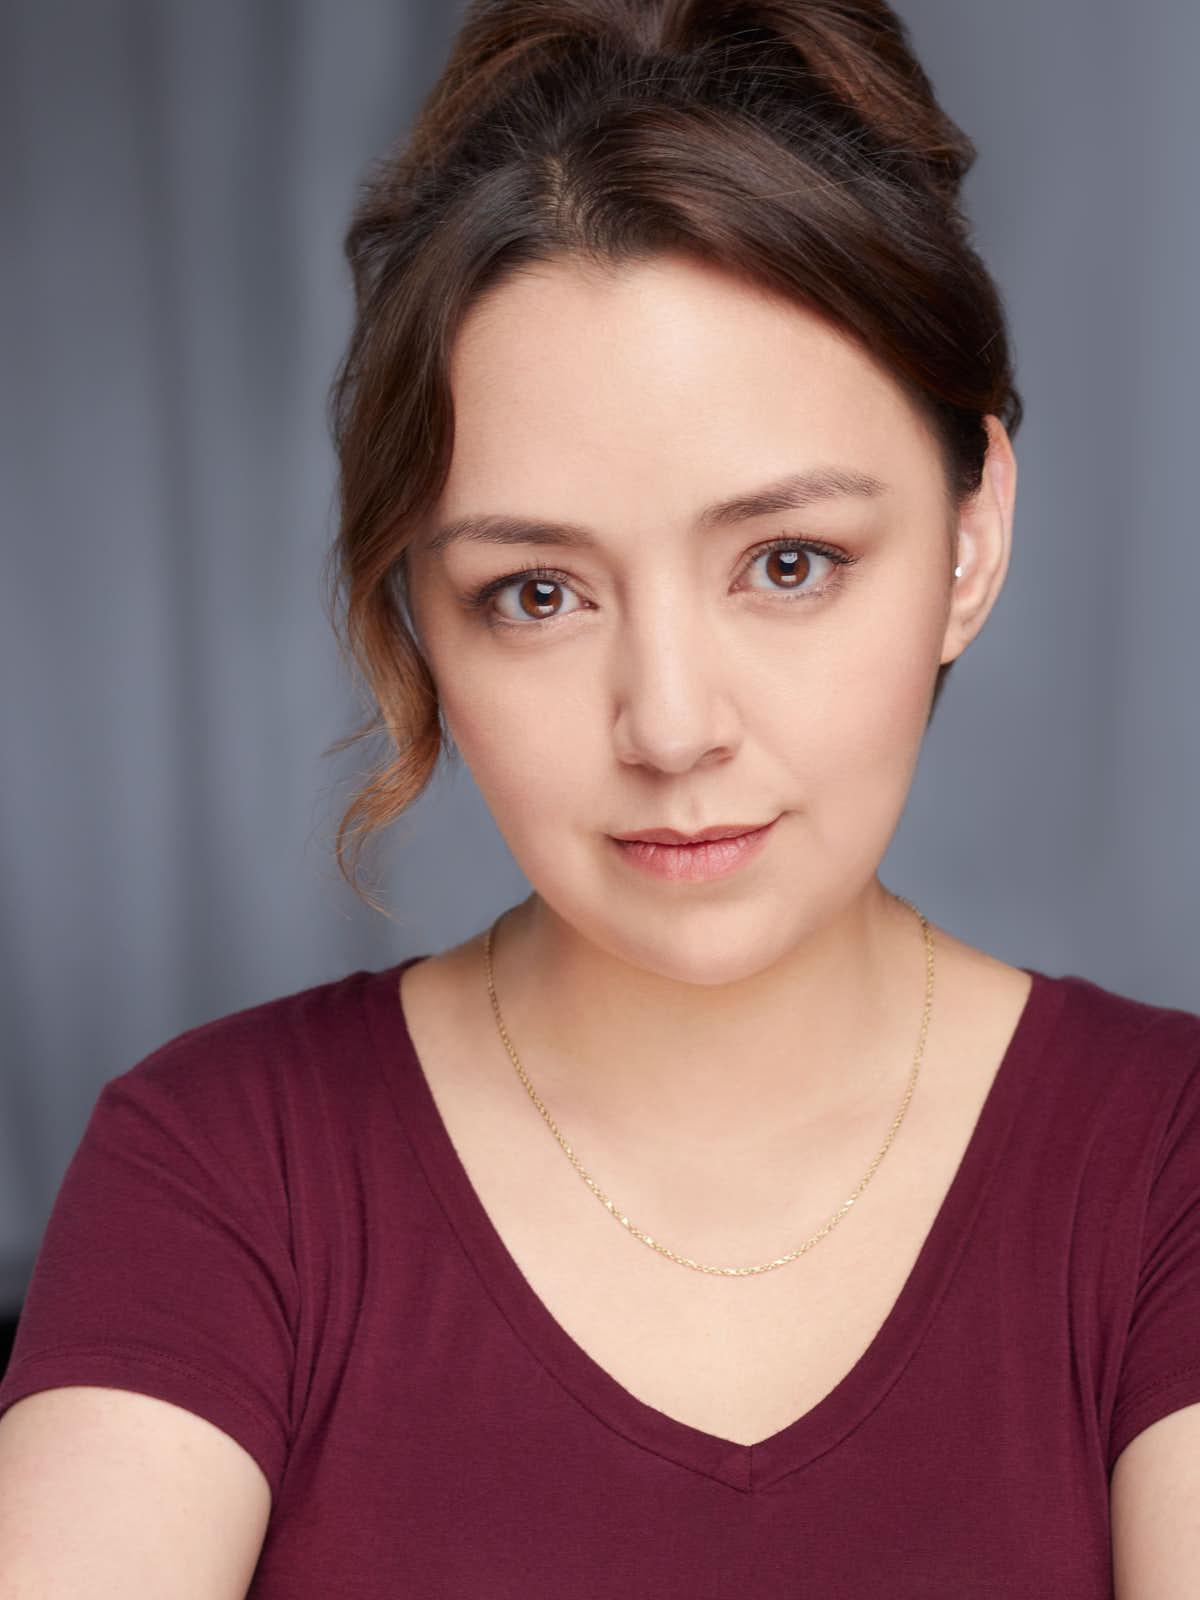 sce-agency-female-actor-josefina-e-1aaa